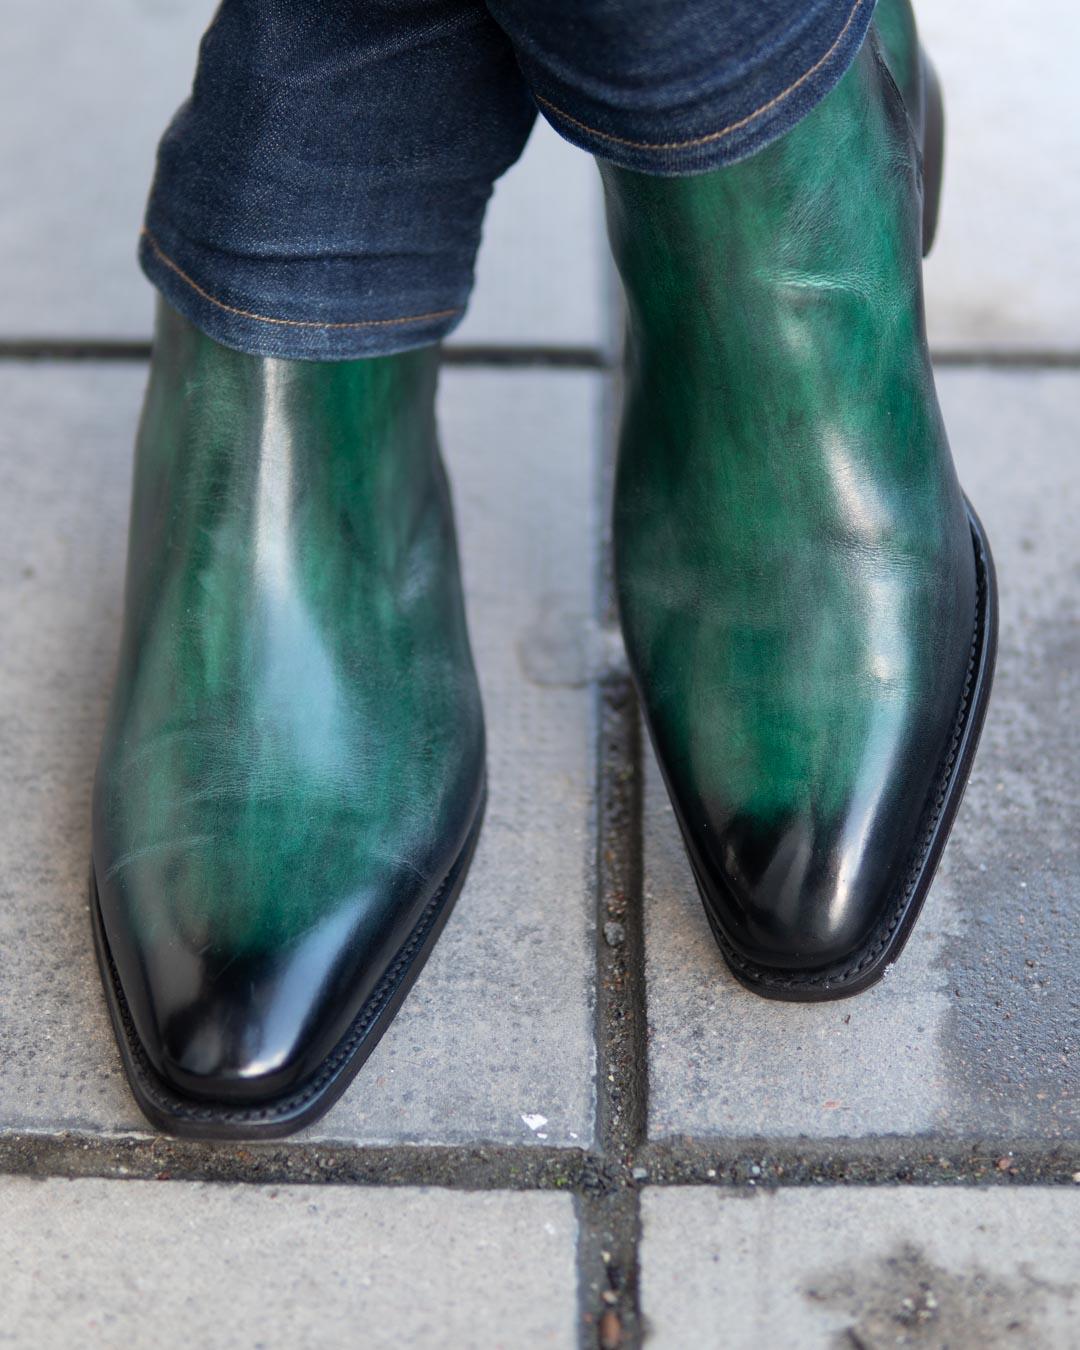 green jodhpur boots